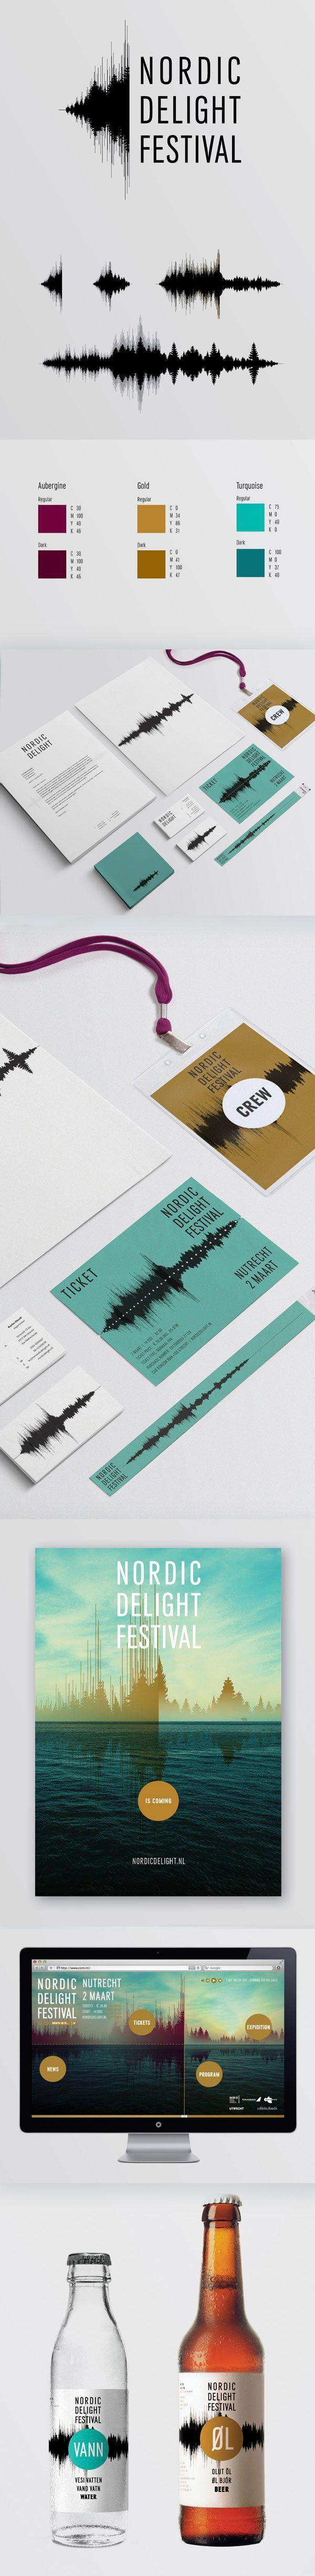 identity / nordic delight festival | #stationary #corporate #design #corporatedesign #identity #branding #marketing < repinned by www.BlickeDeeler.de | Take a look at www.LogoGestaltung-Hamburg.de